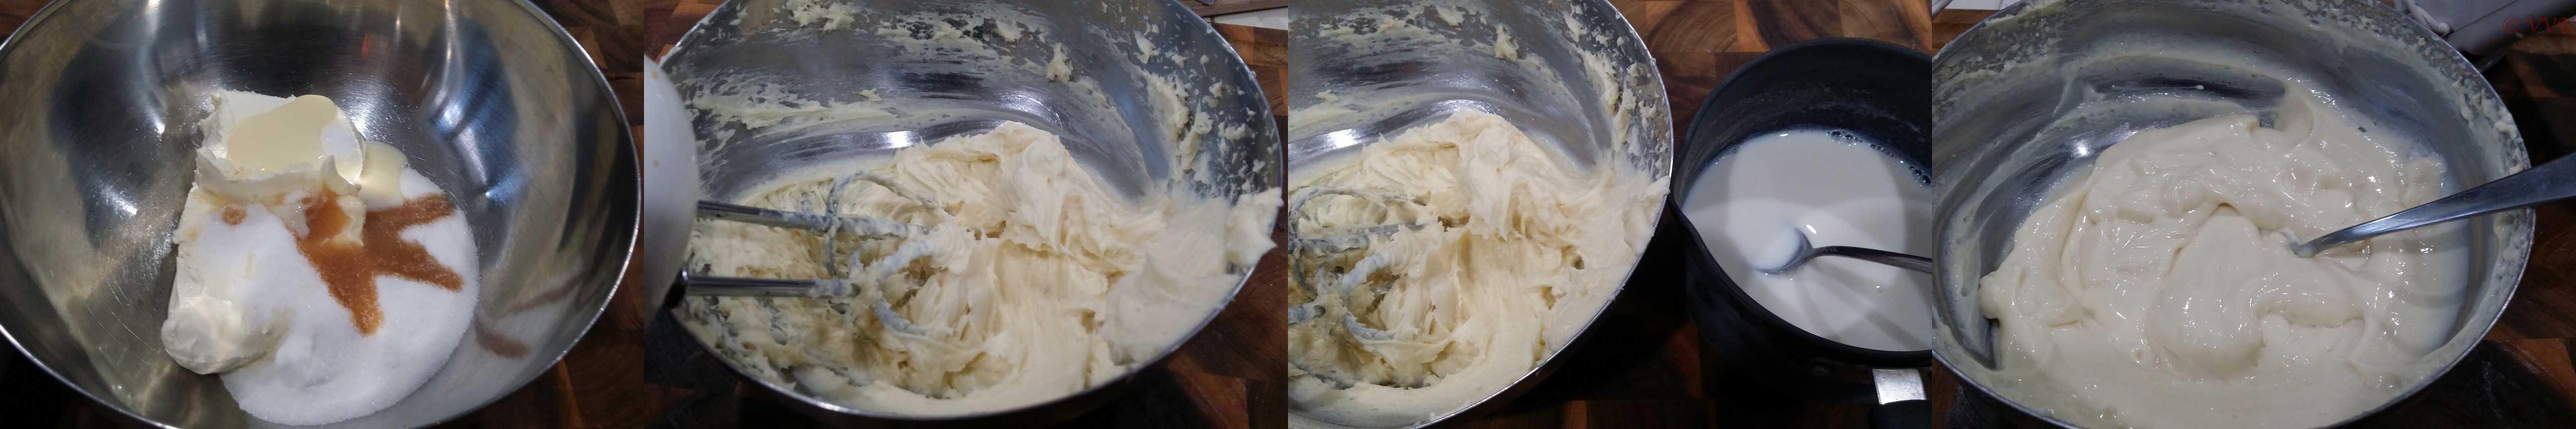 Adding the agar agar milk mix to the cheese mix